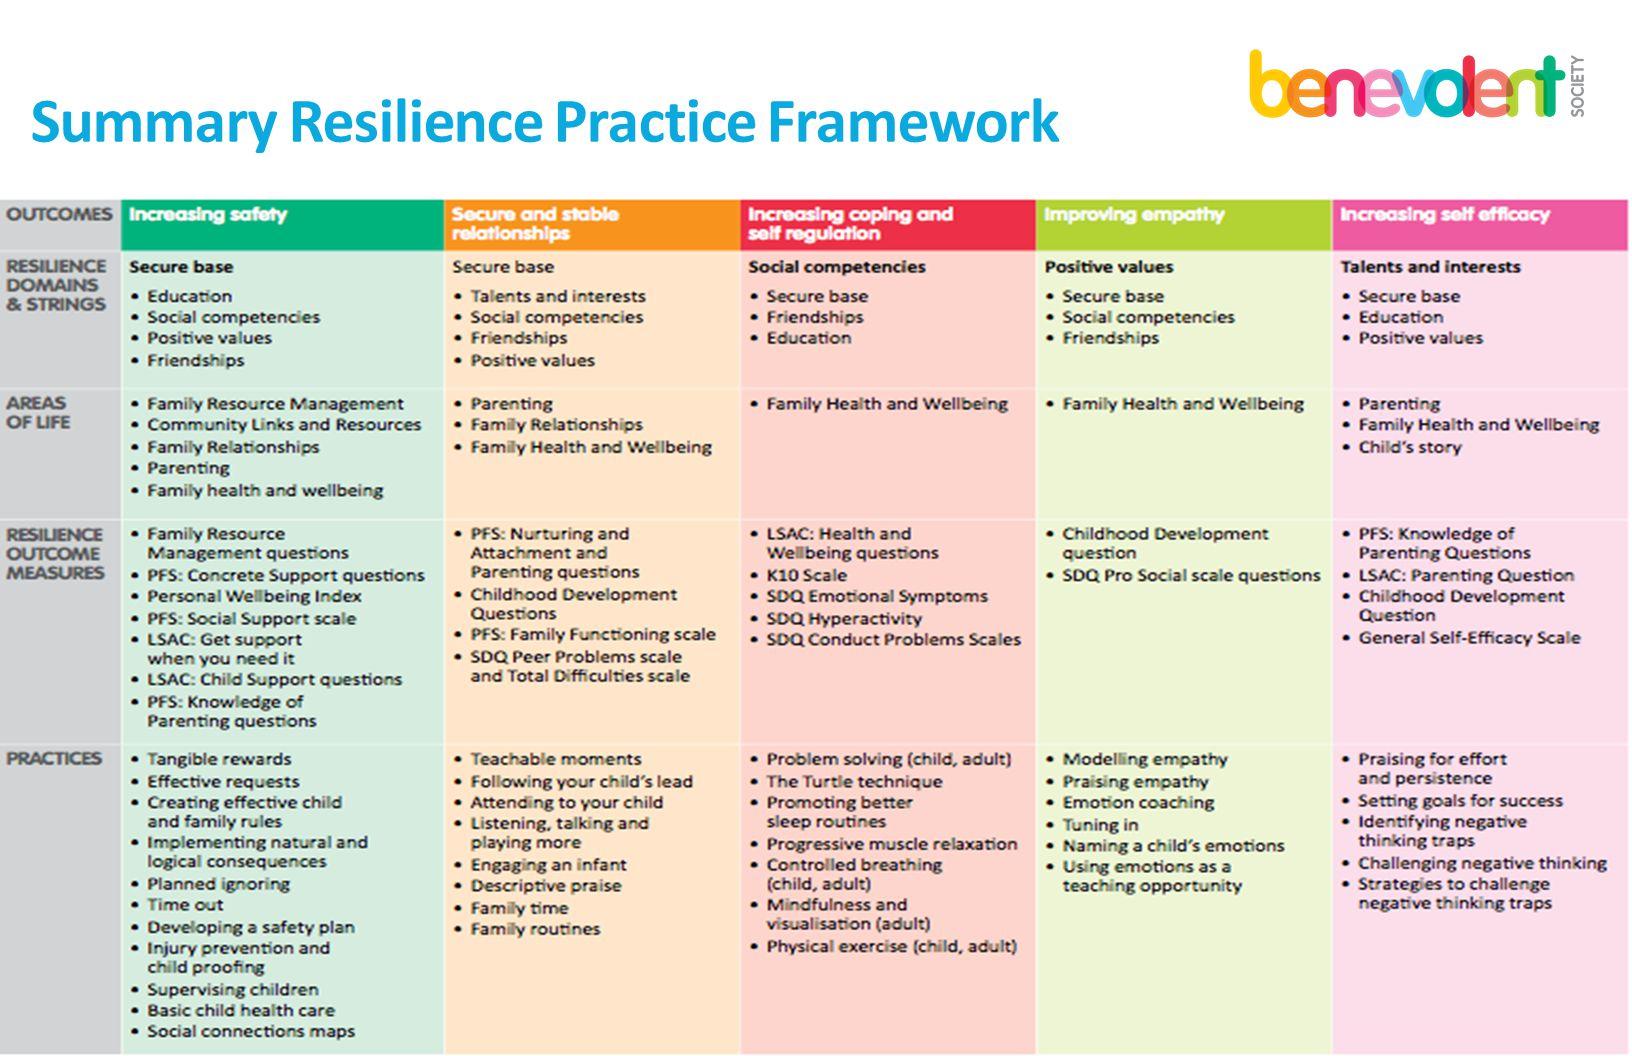 Summary Resilience Practice Framework